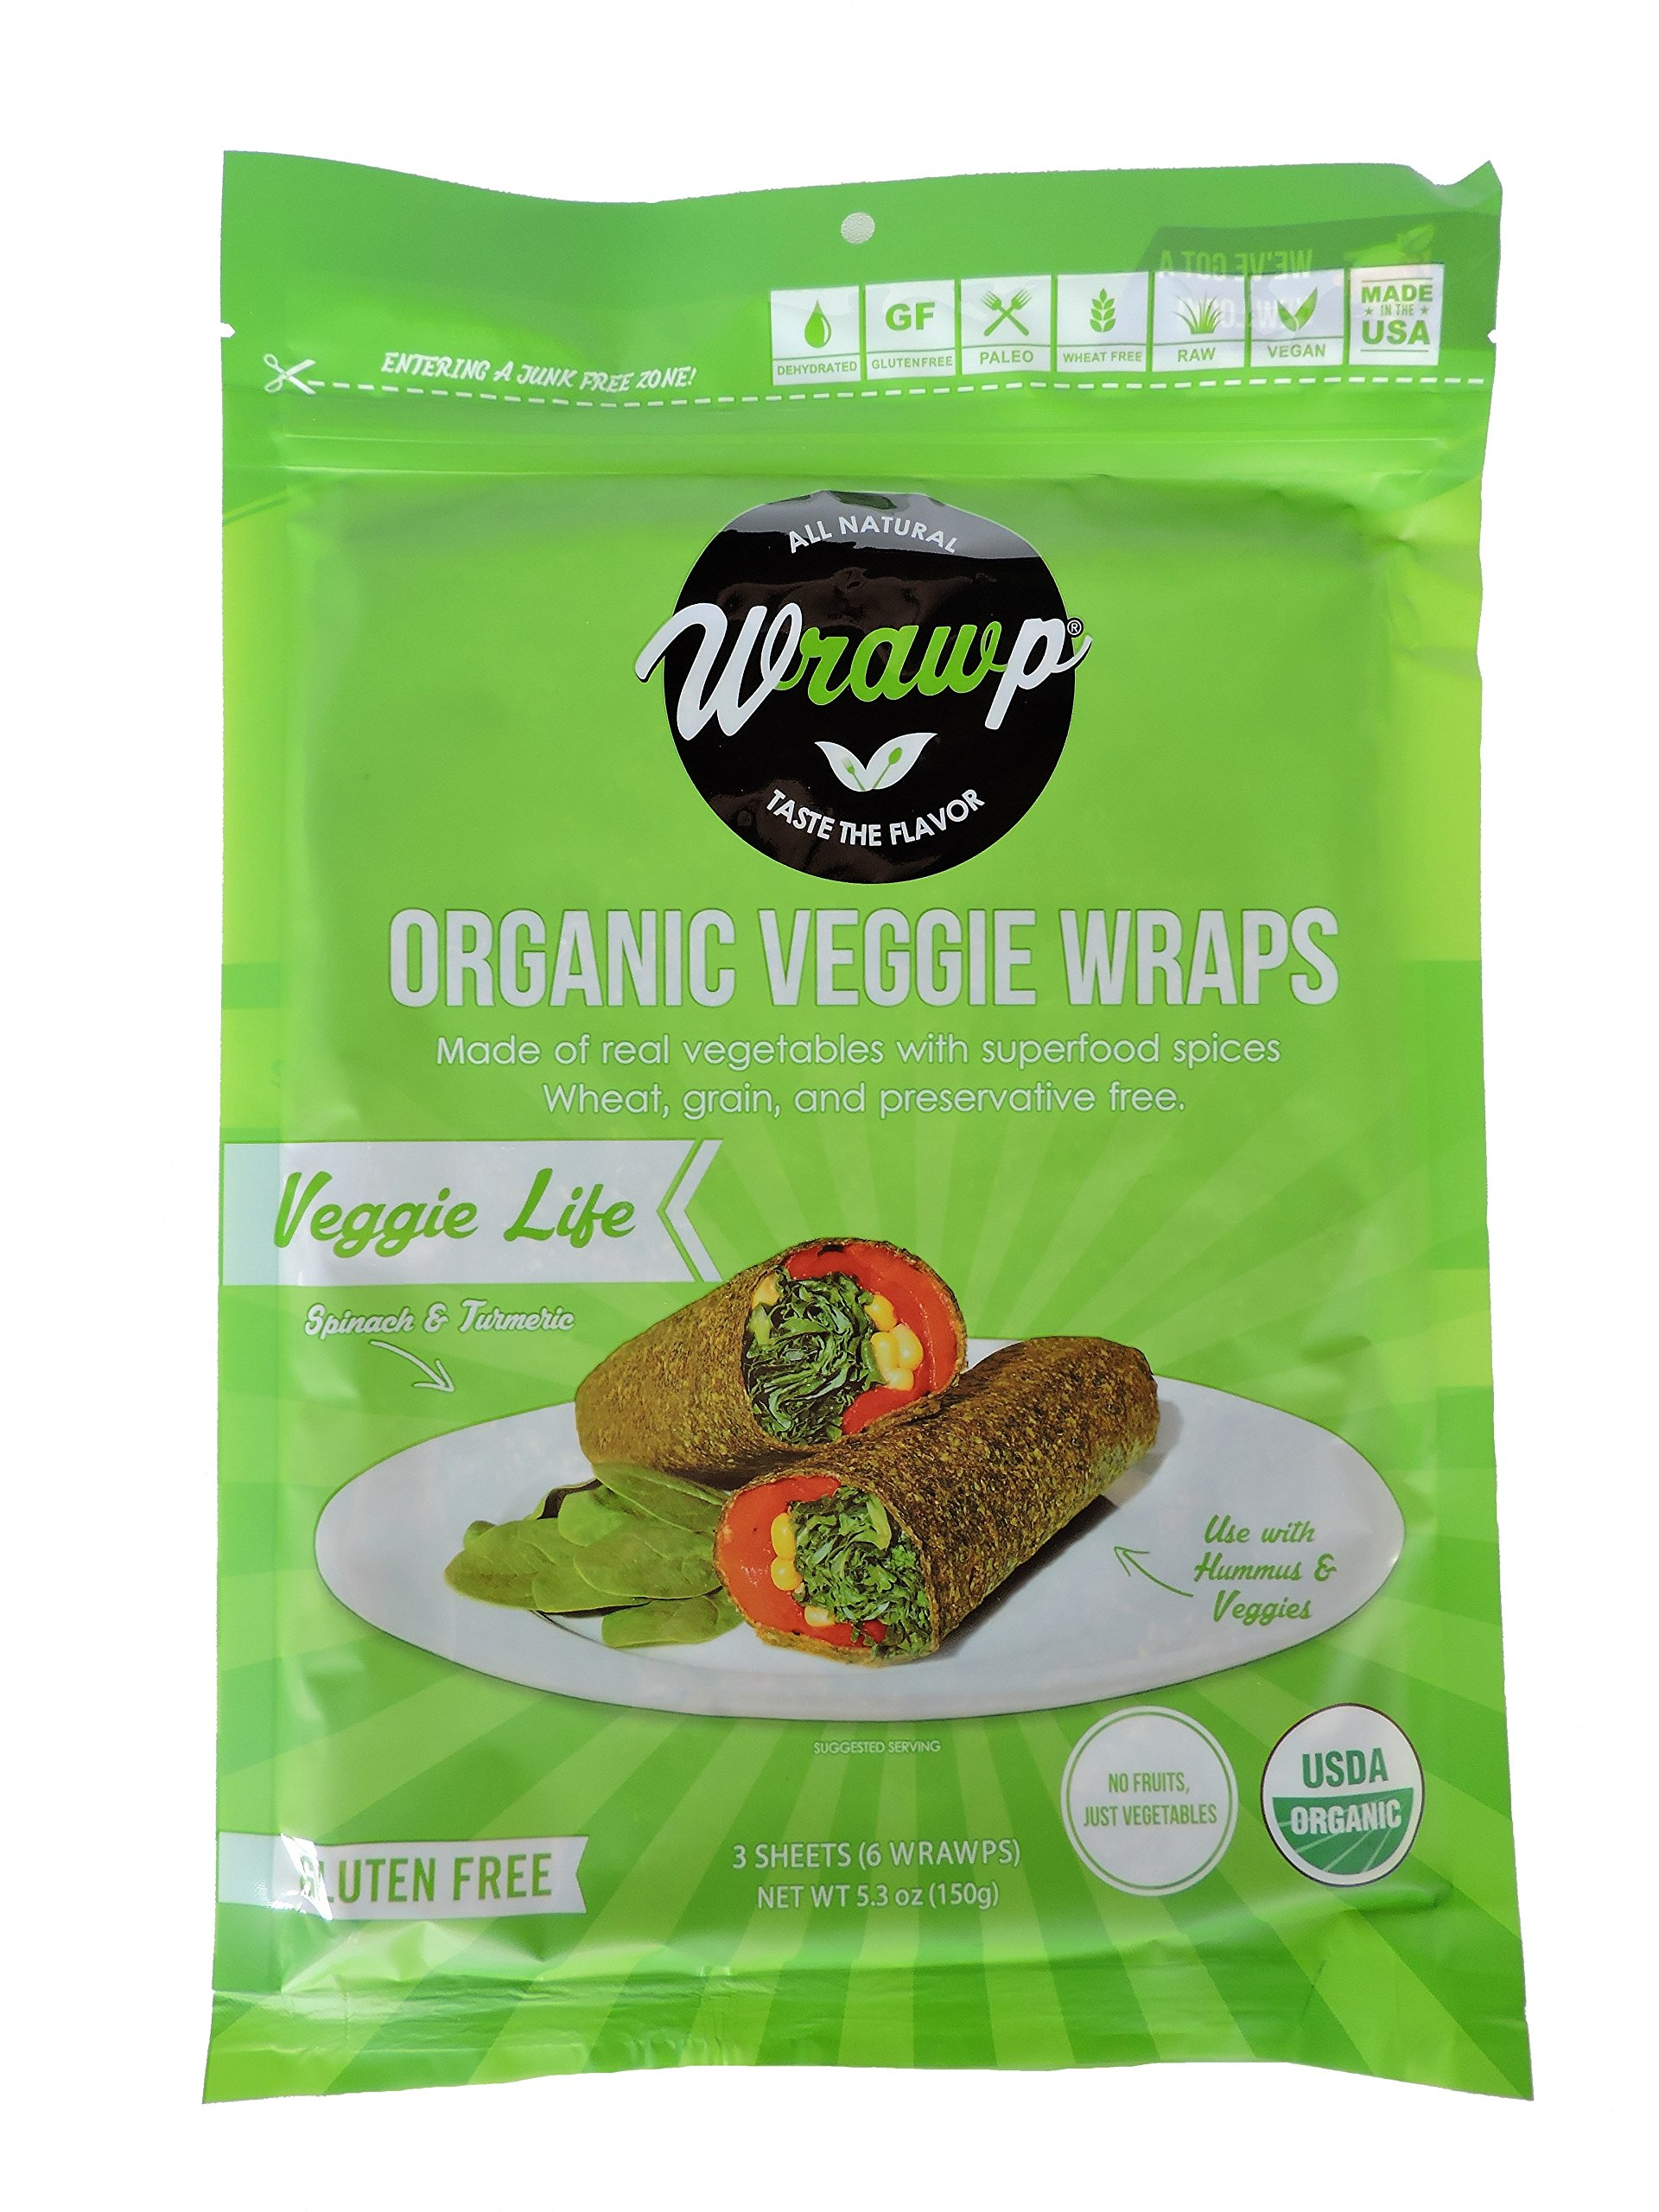 Wrawp Organic Veggie Flatbread, Life, 4.2 Ounce